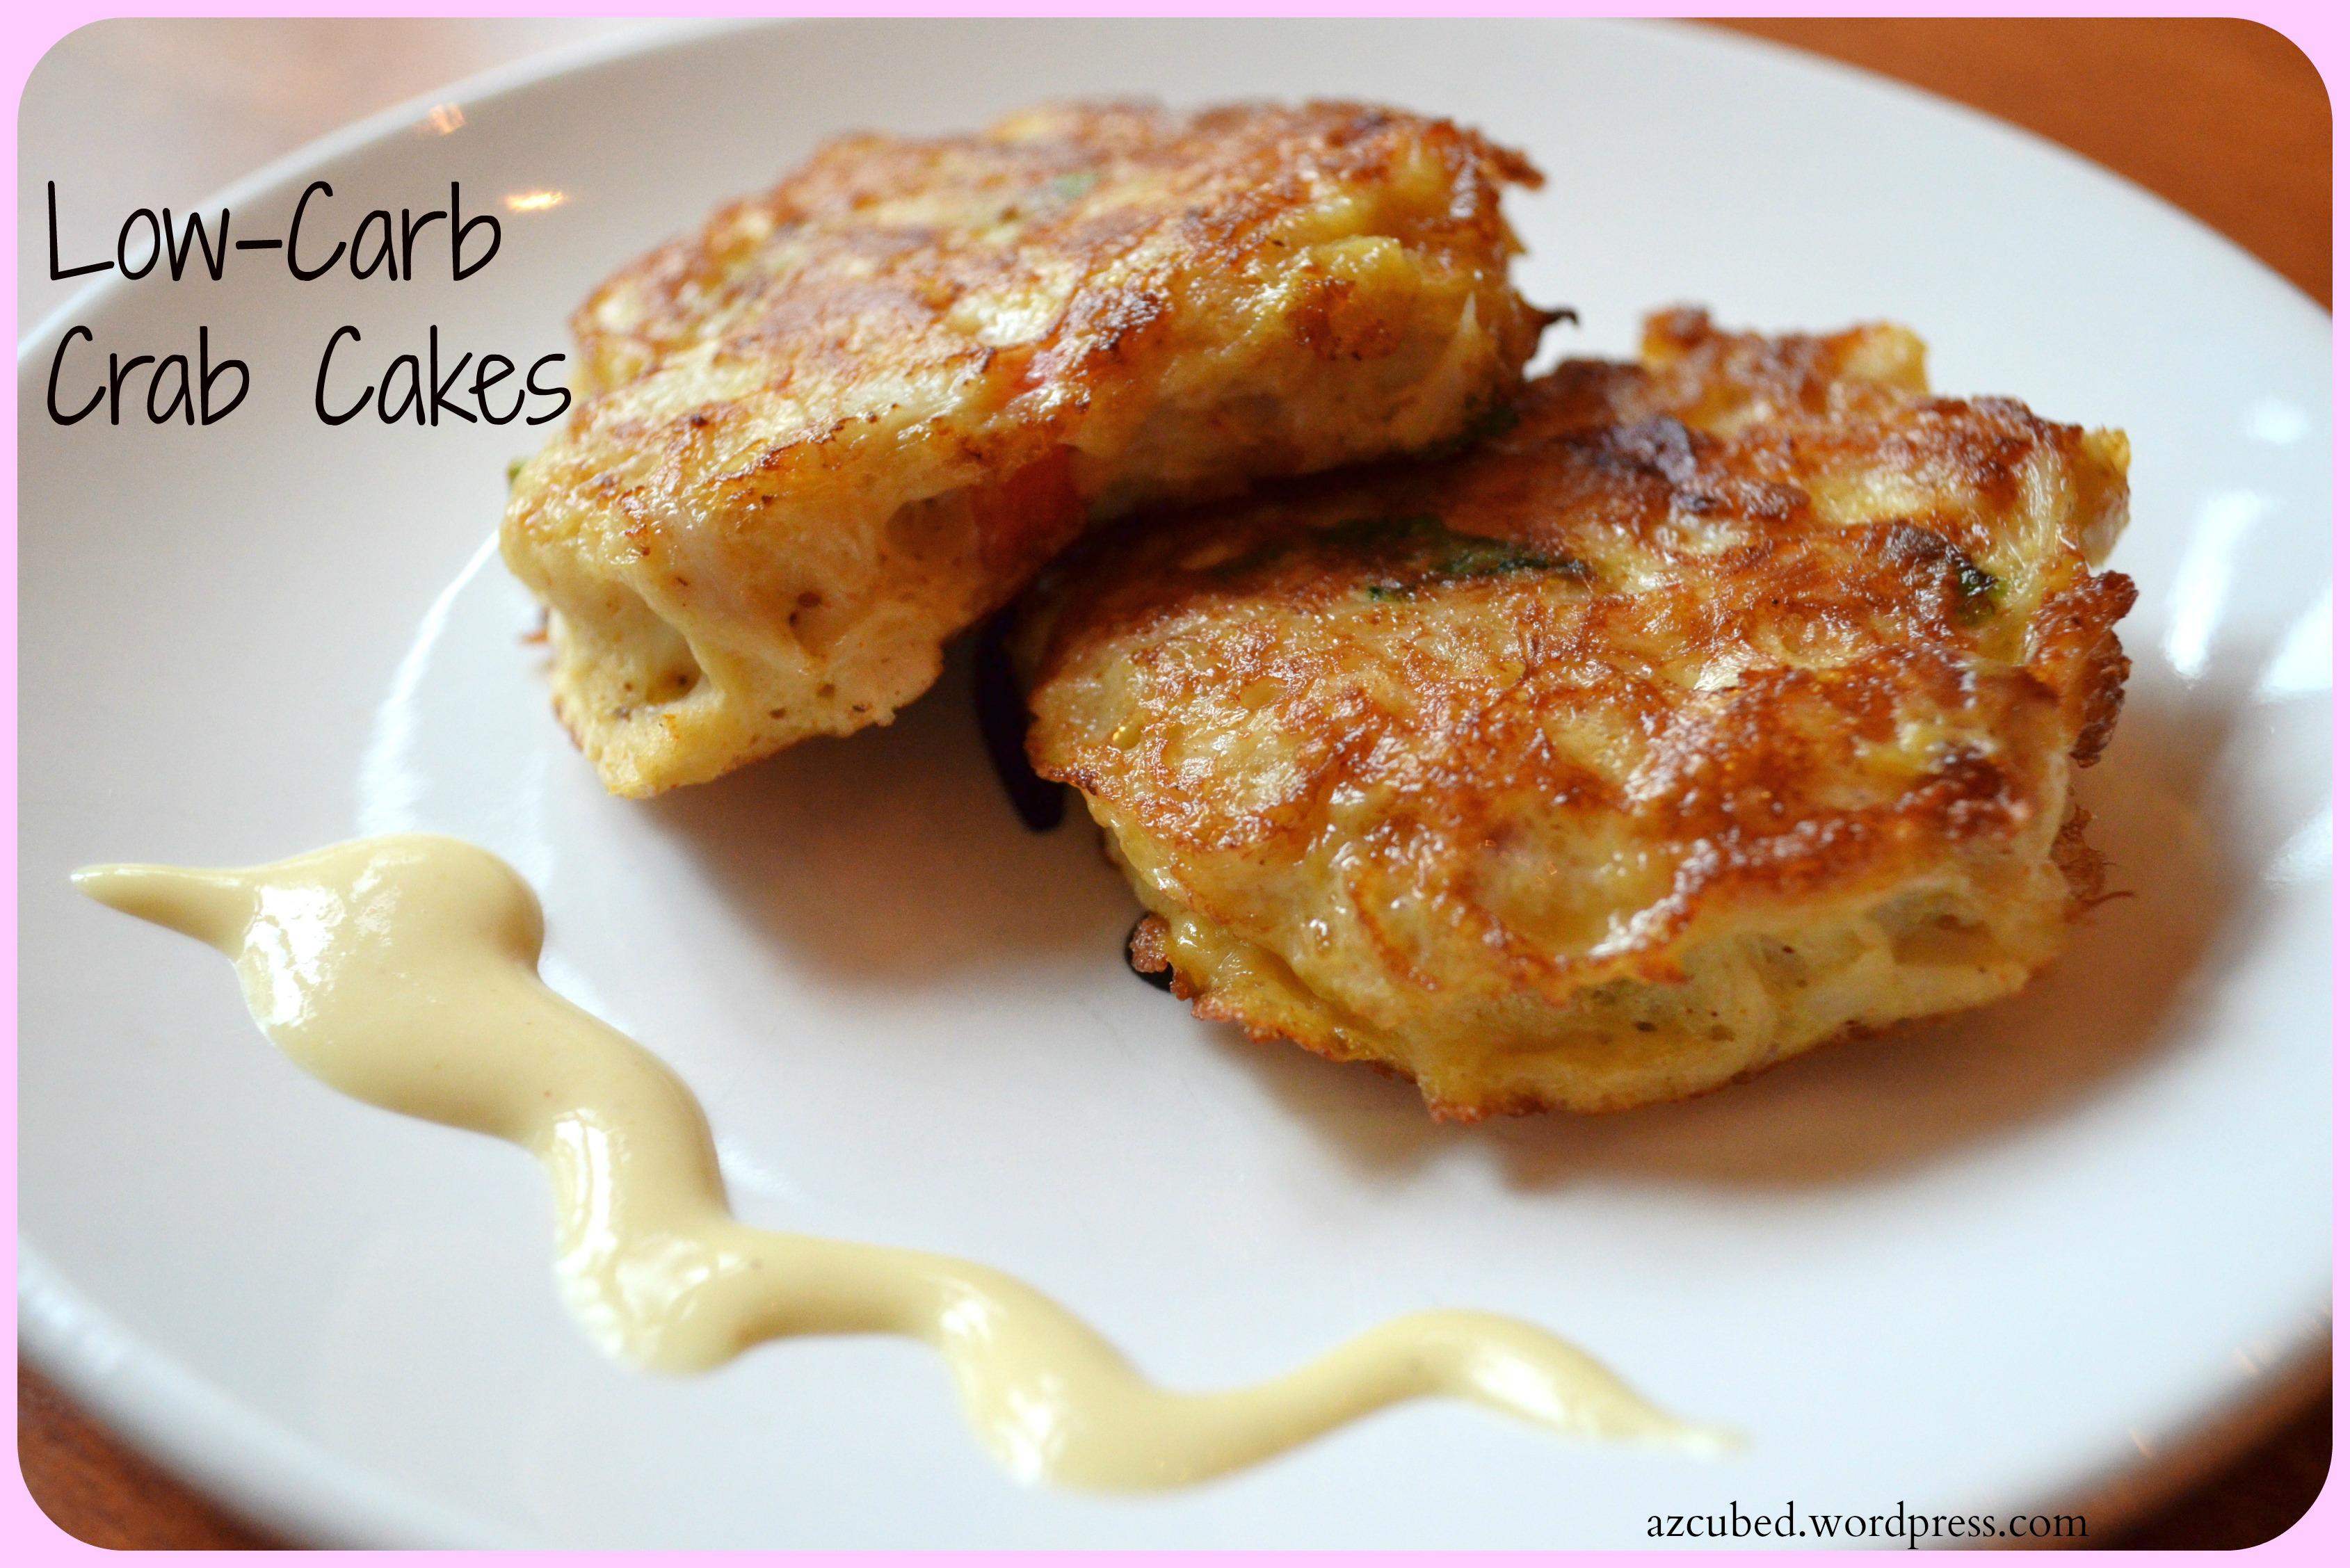 Dijon Mustard Sauce For Crab Cakes